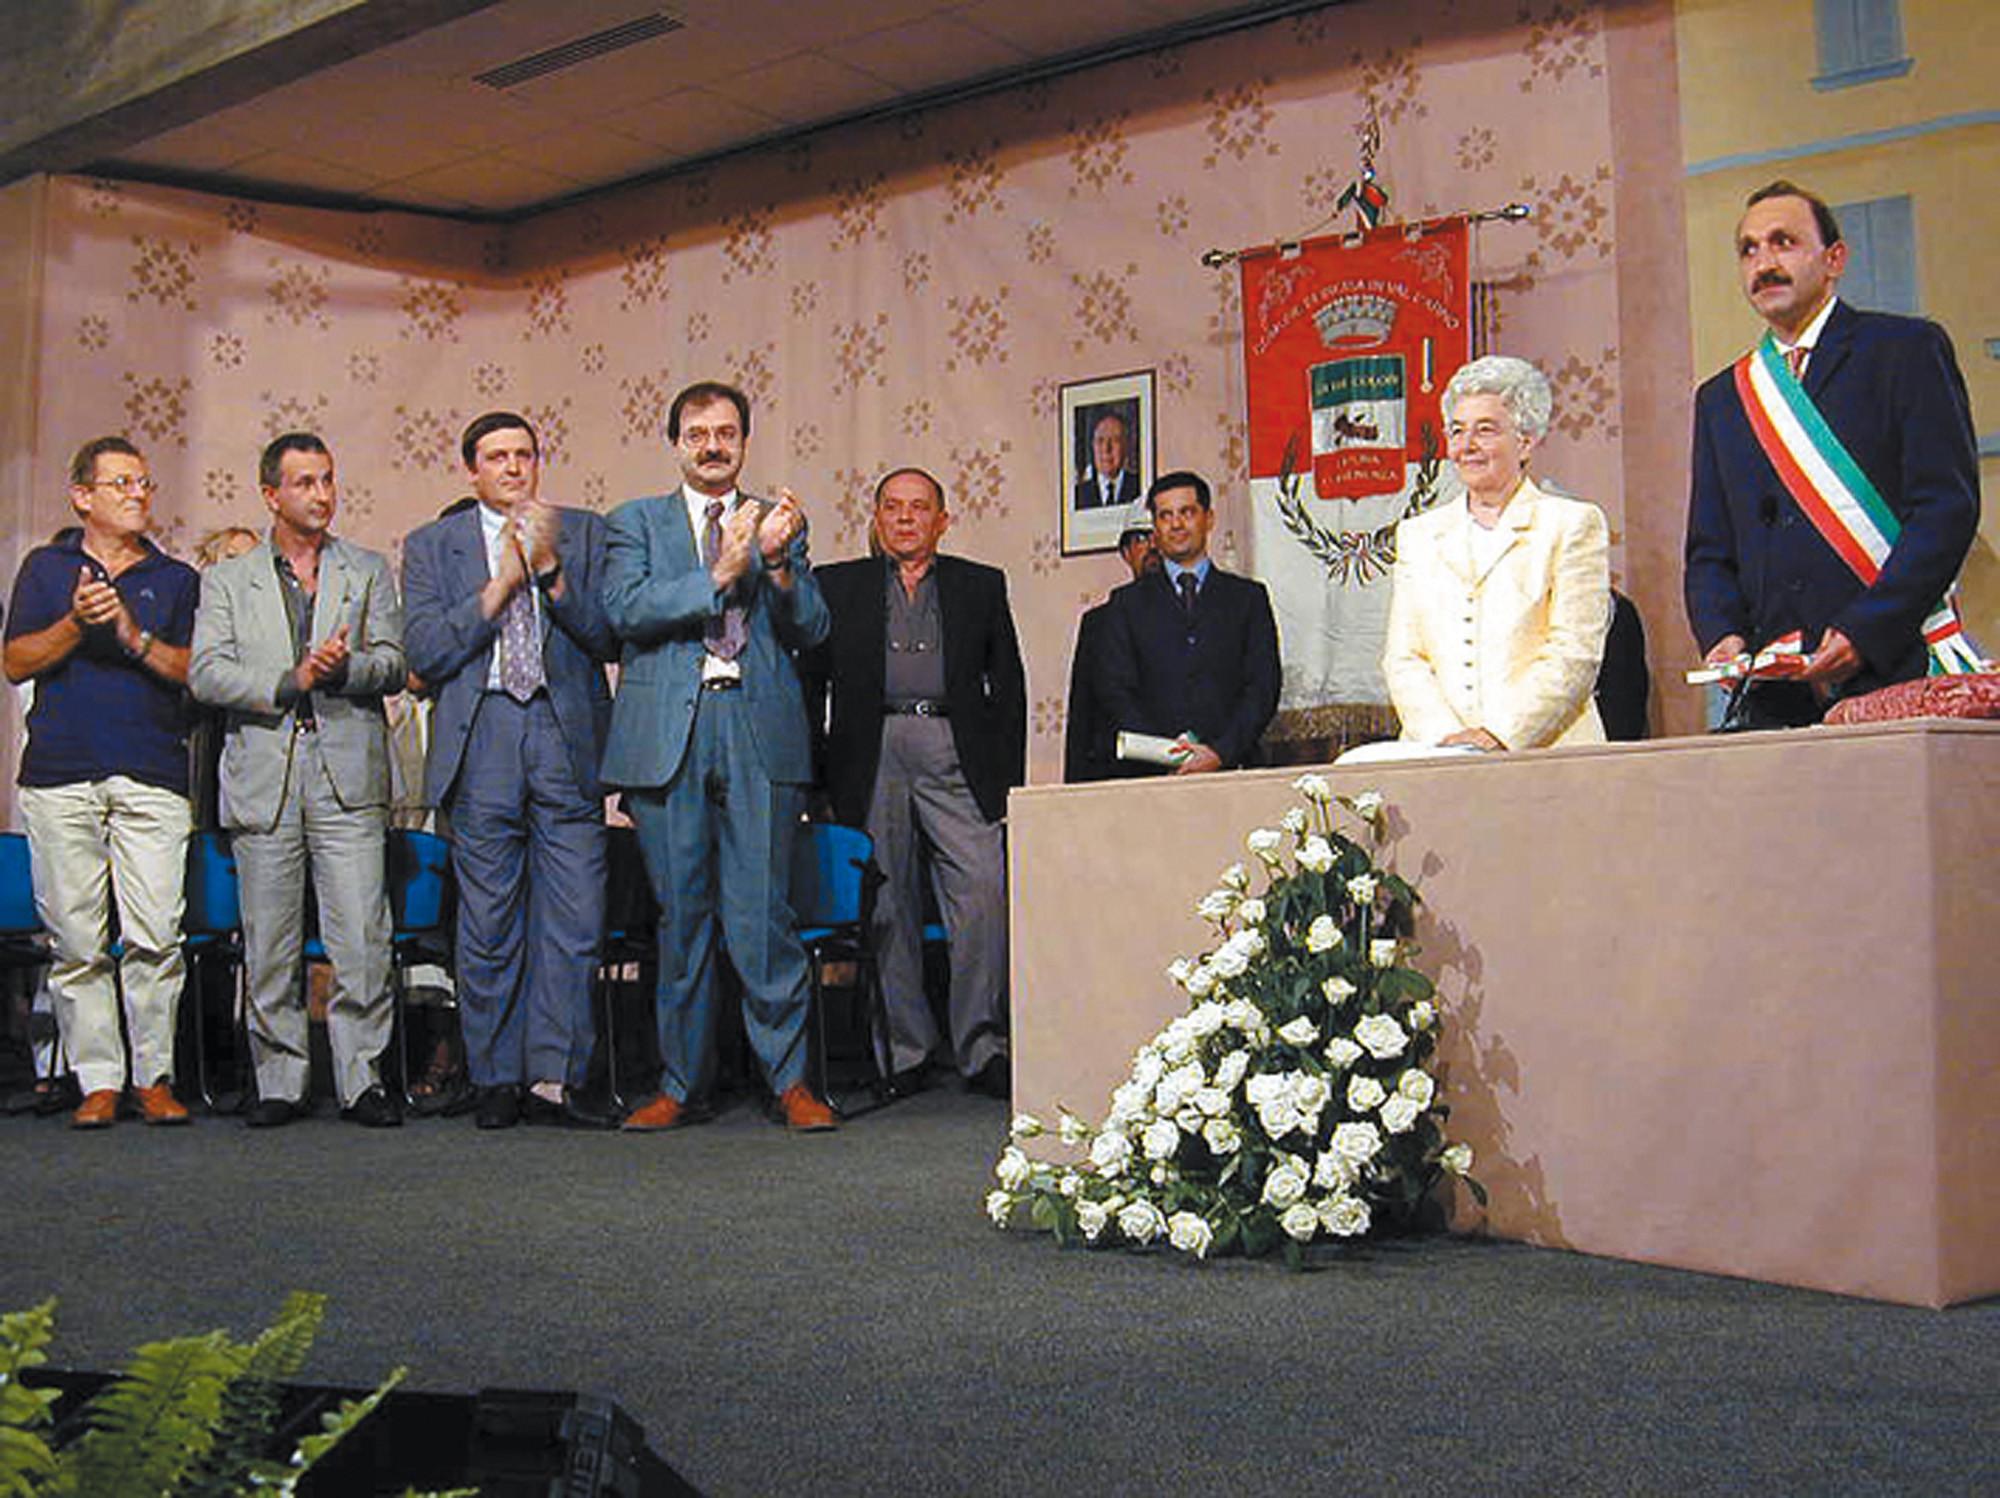 Cittadinanza onoraria 2000